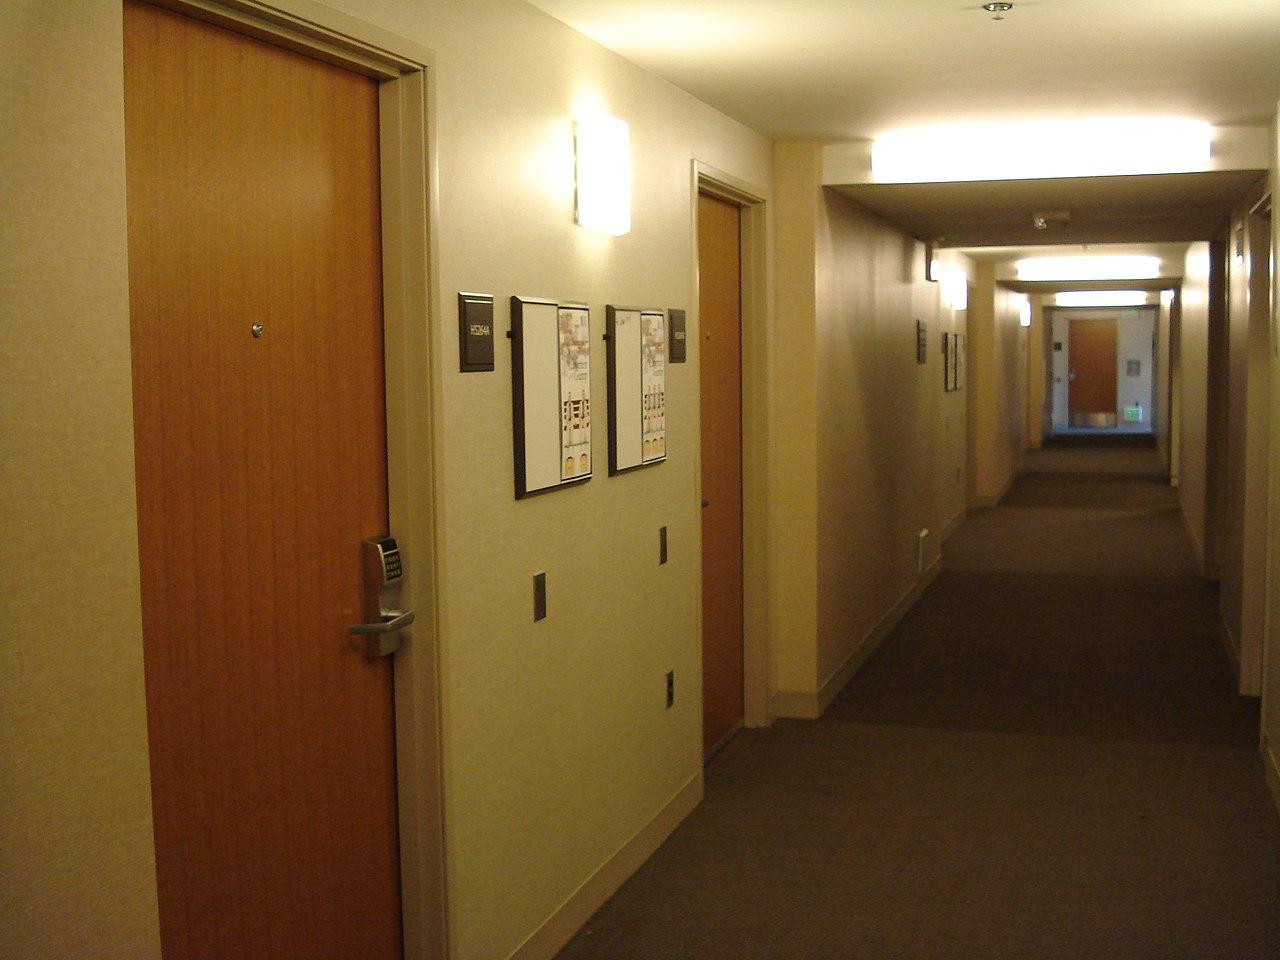 Ucla Dorm Room Fridge Limit Size